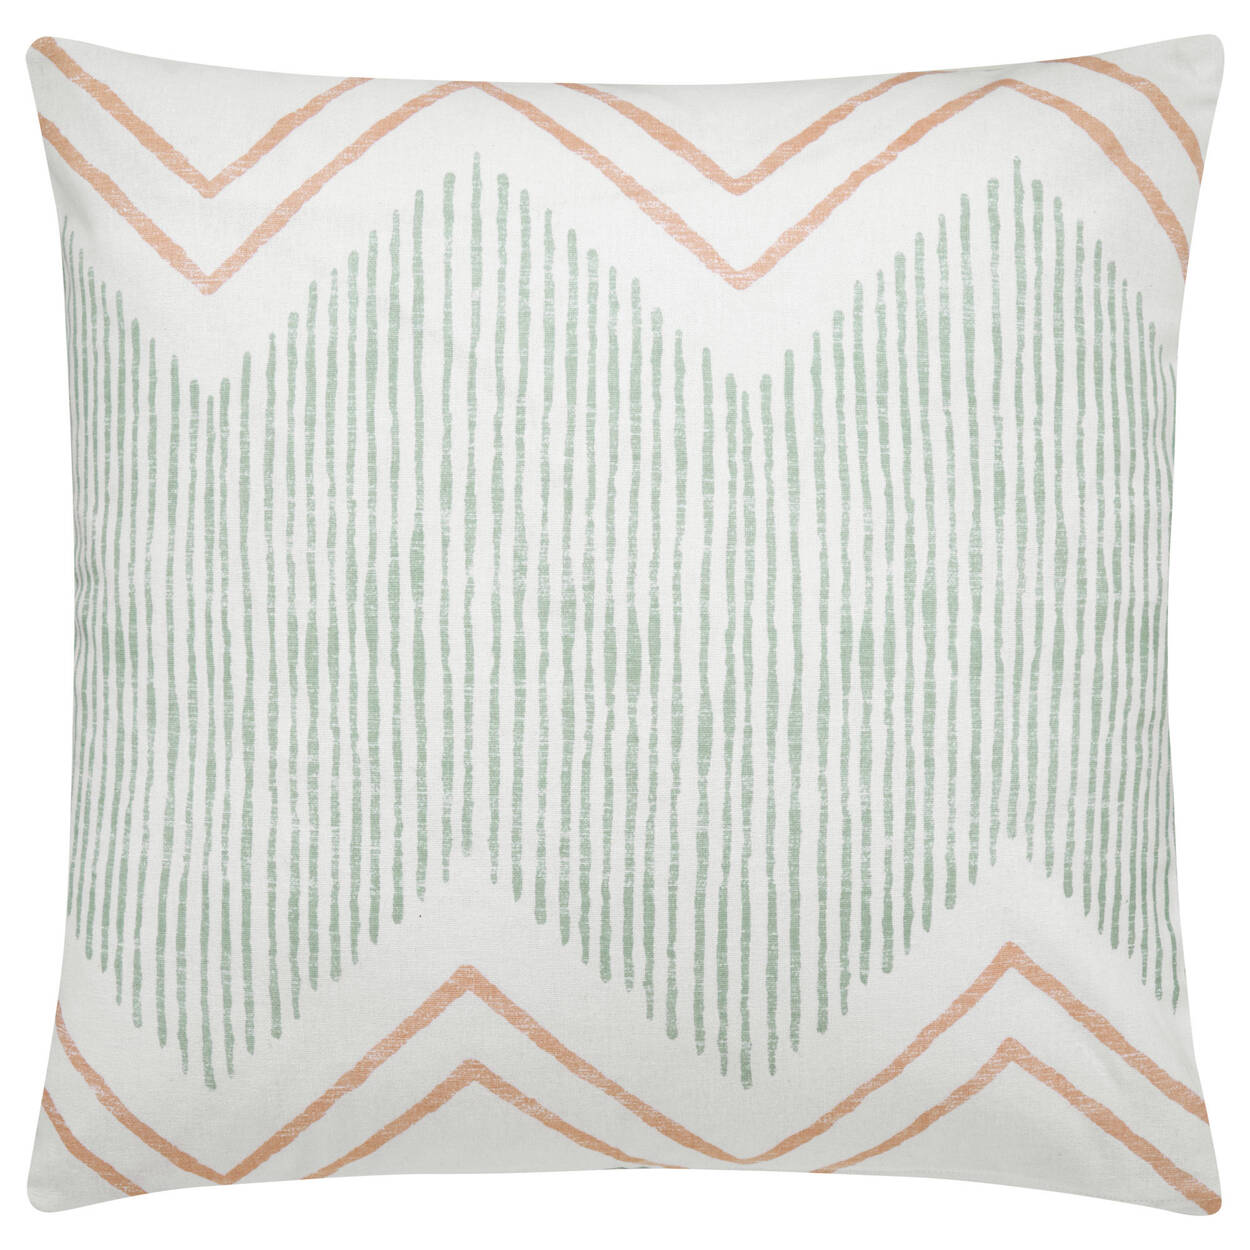 "Dario Decorative Pillow Cover 18"" X 18"""